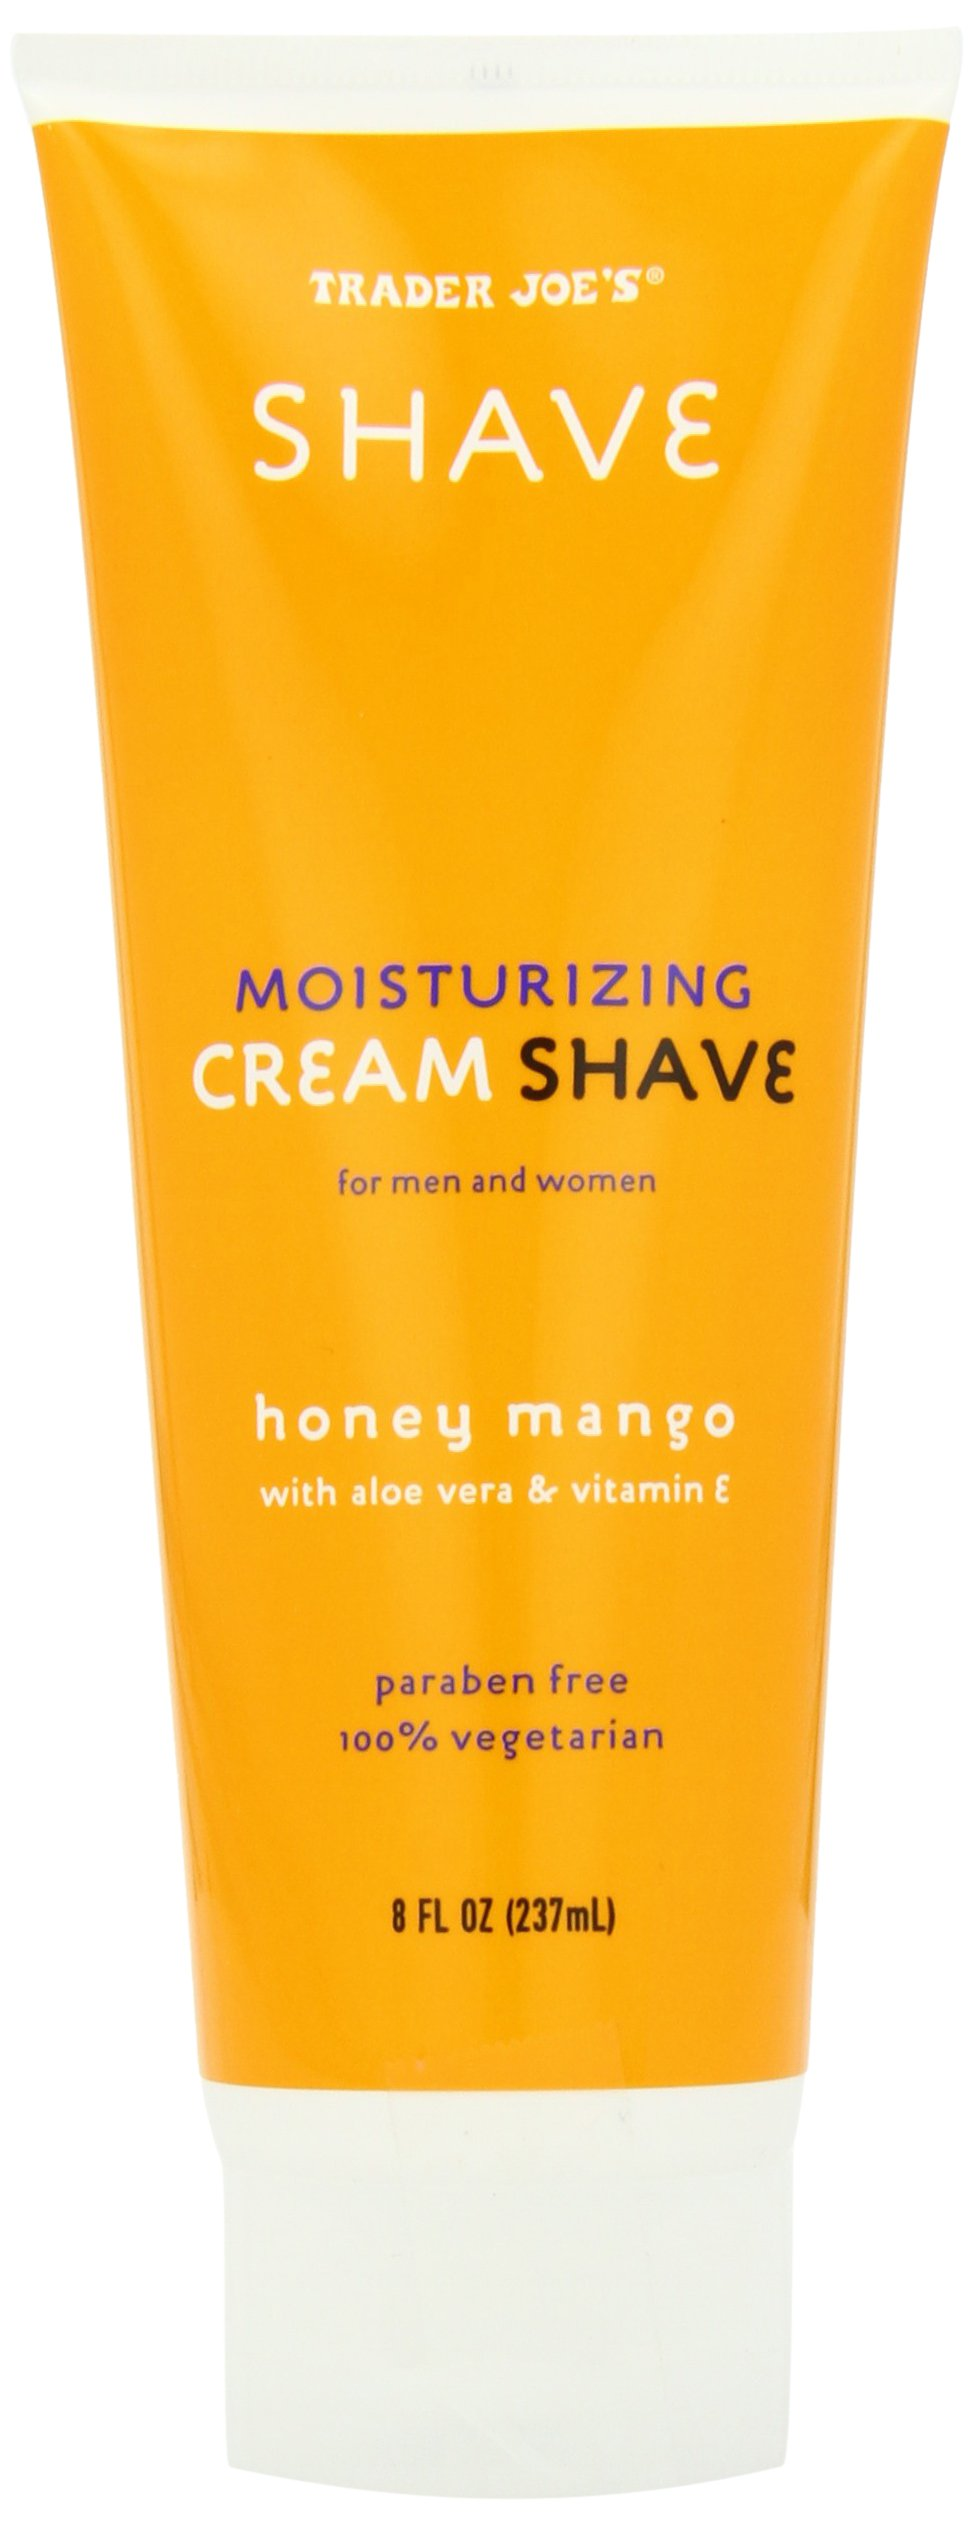 Trader Joe's Moisturizing Cream Shave Honey Mango